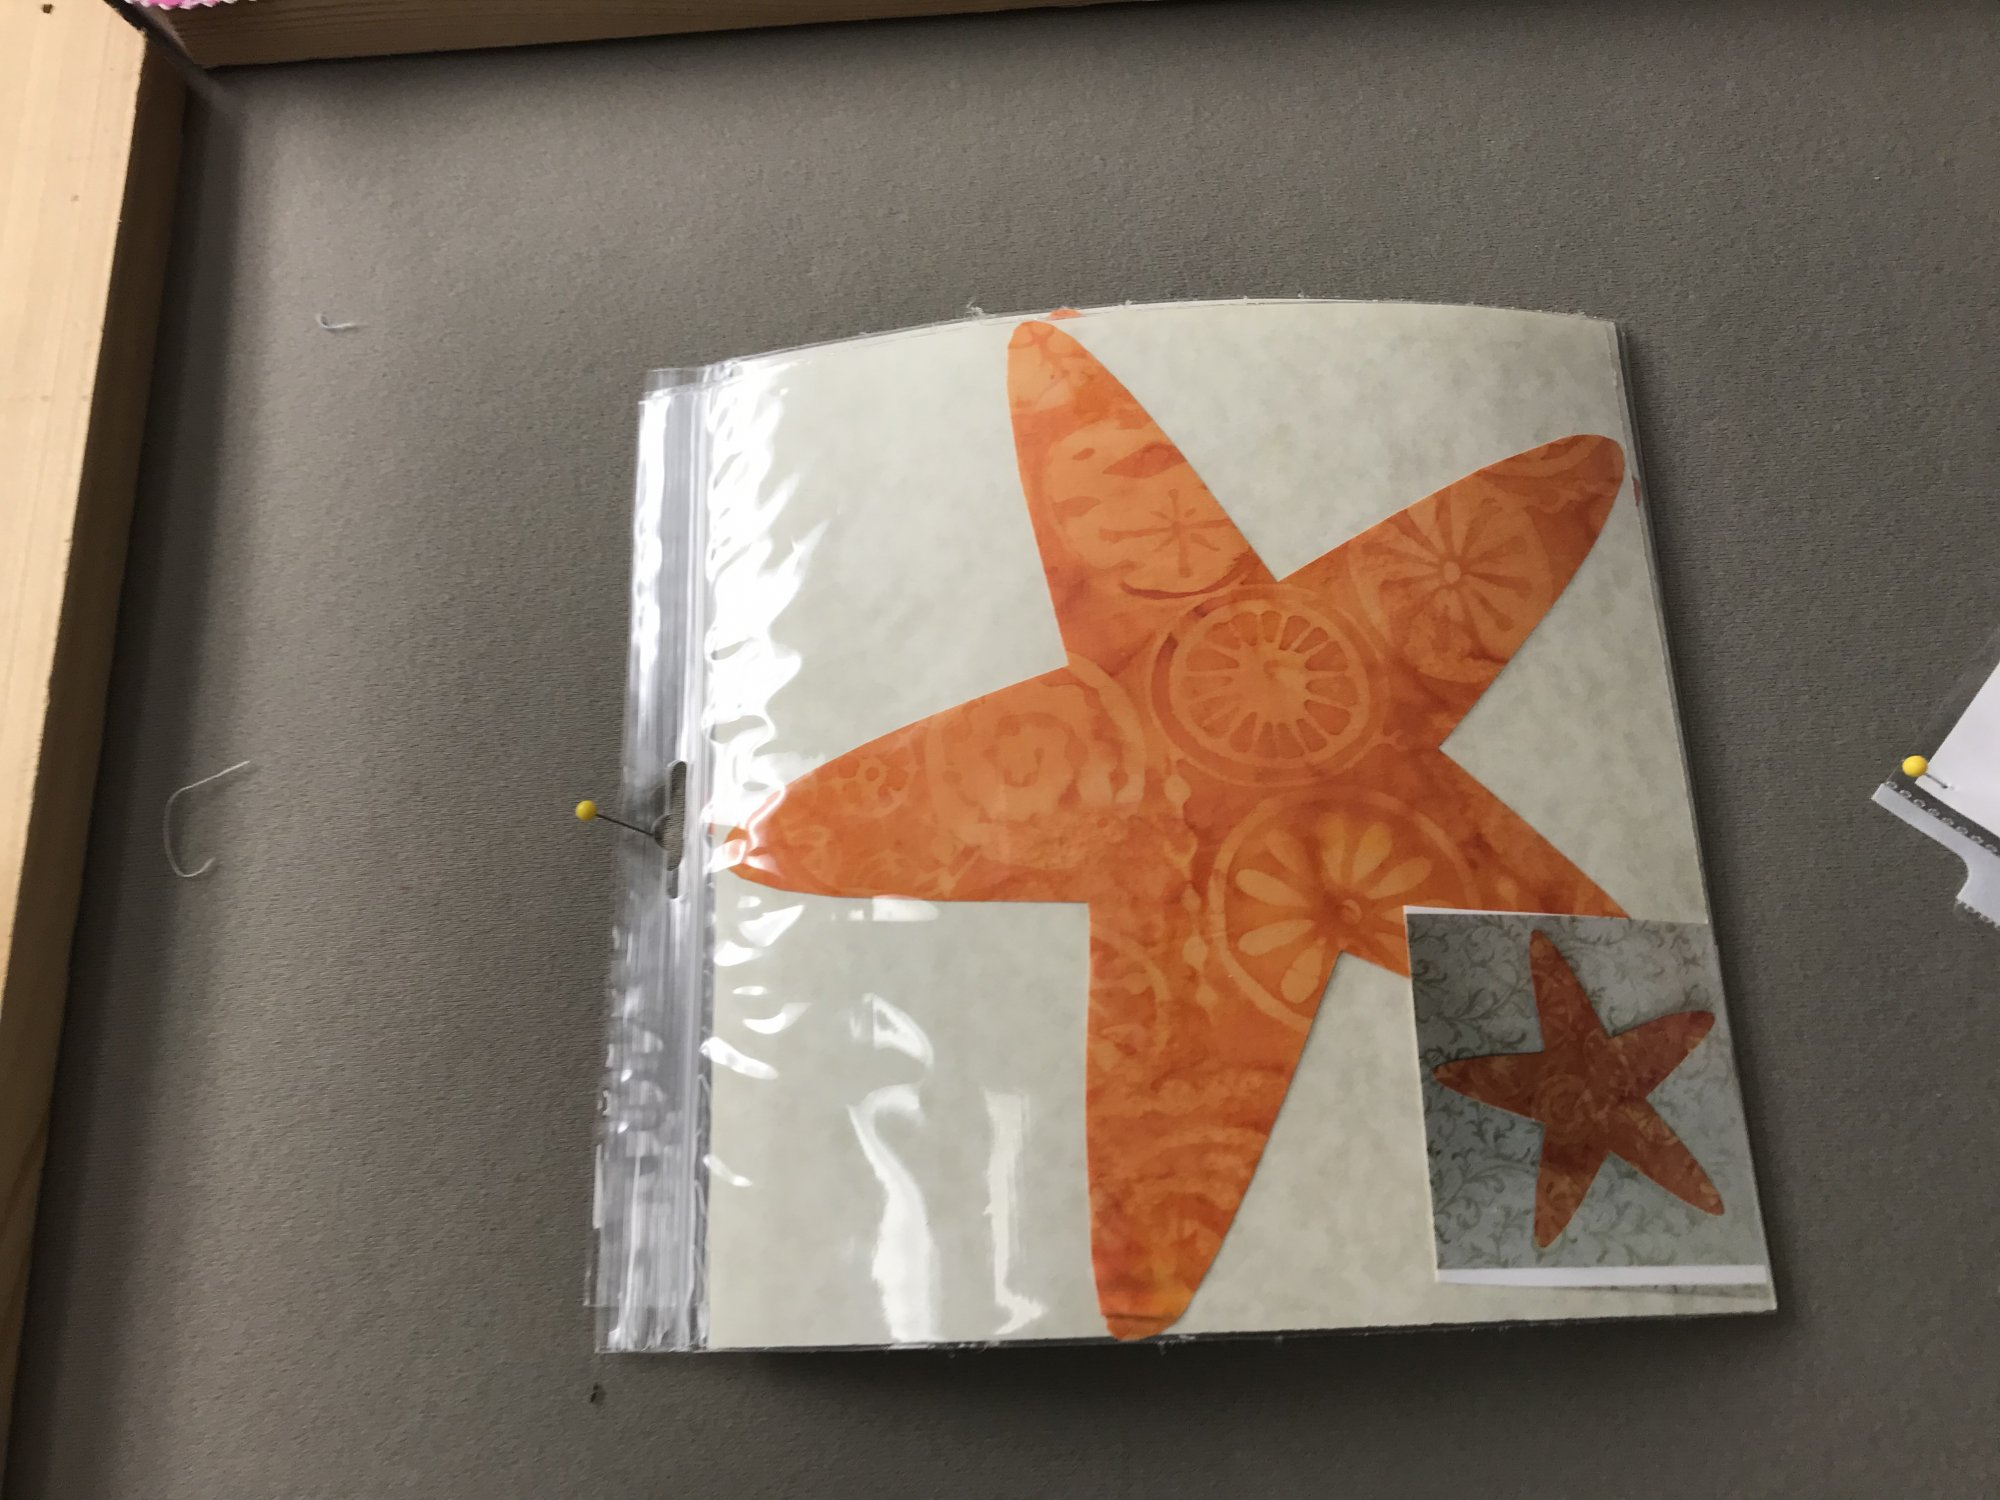 Applique Designs - Laser Cut and Pre Fused - STAR FISH